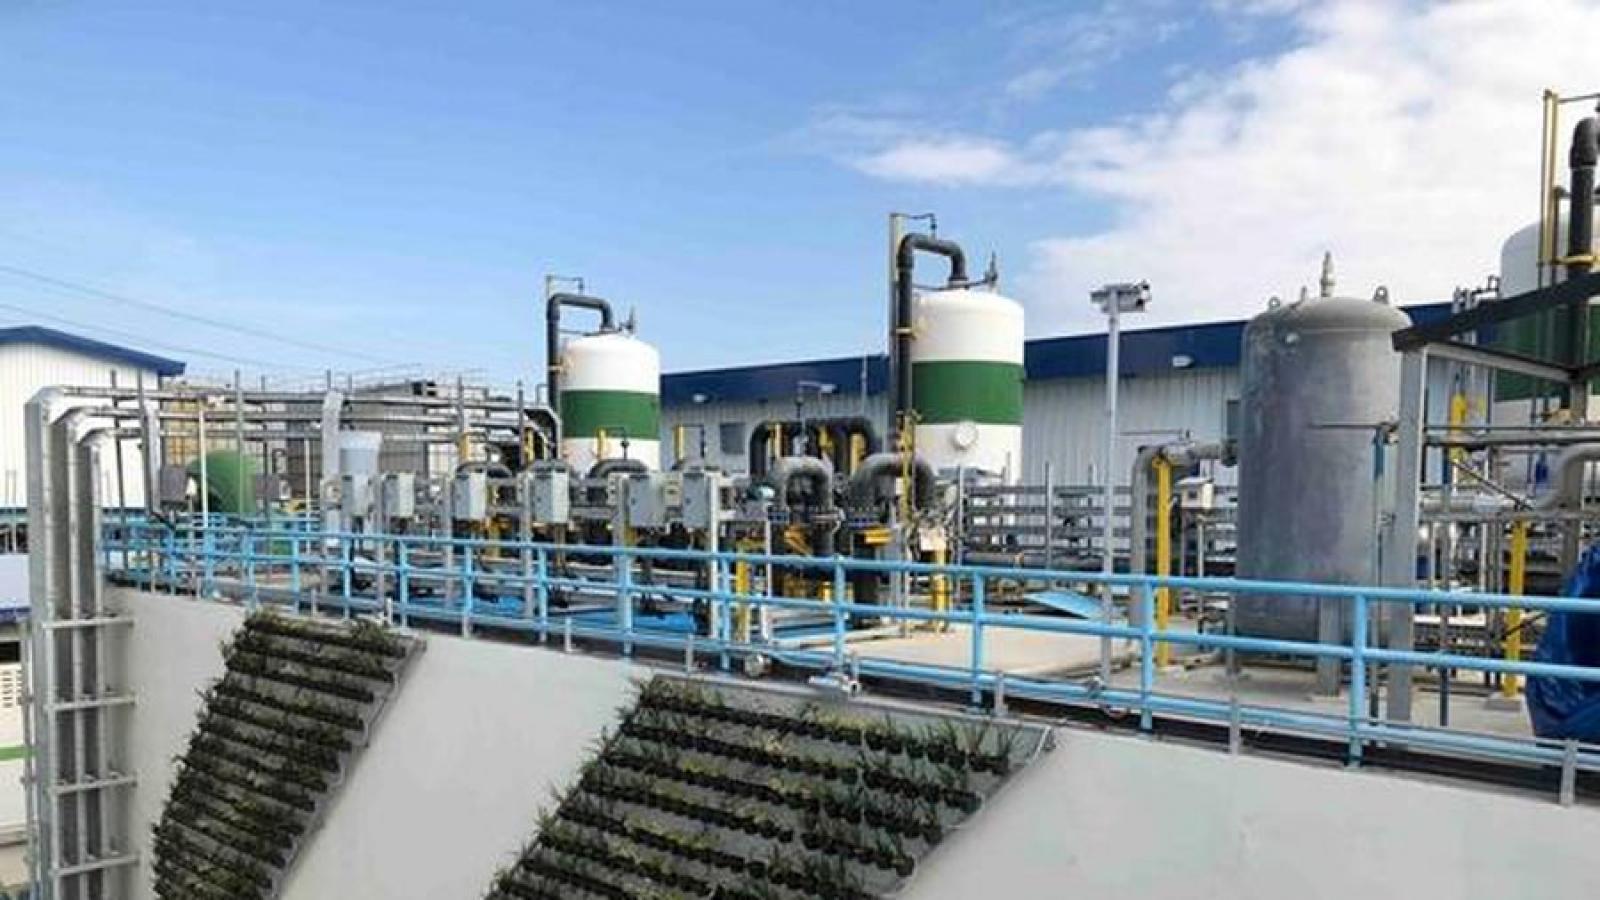 EVFTA draws increasing number of Spanish investors to Vietnam